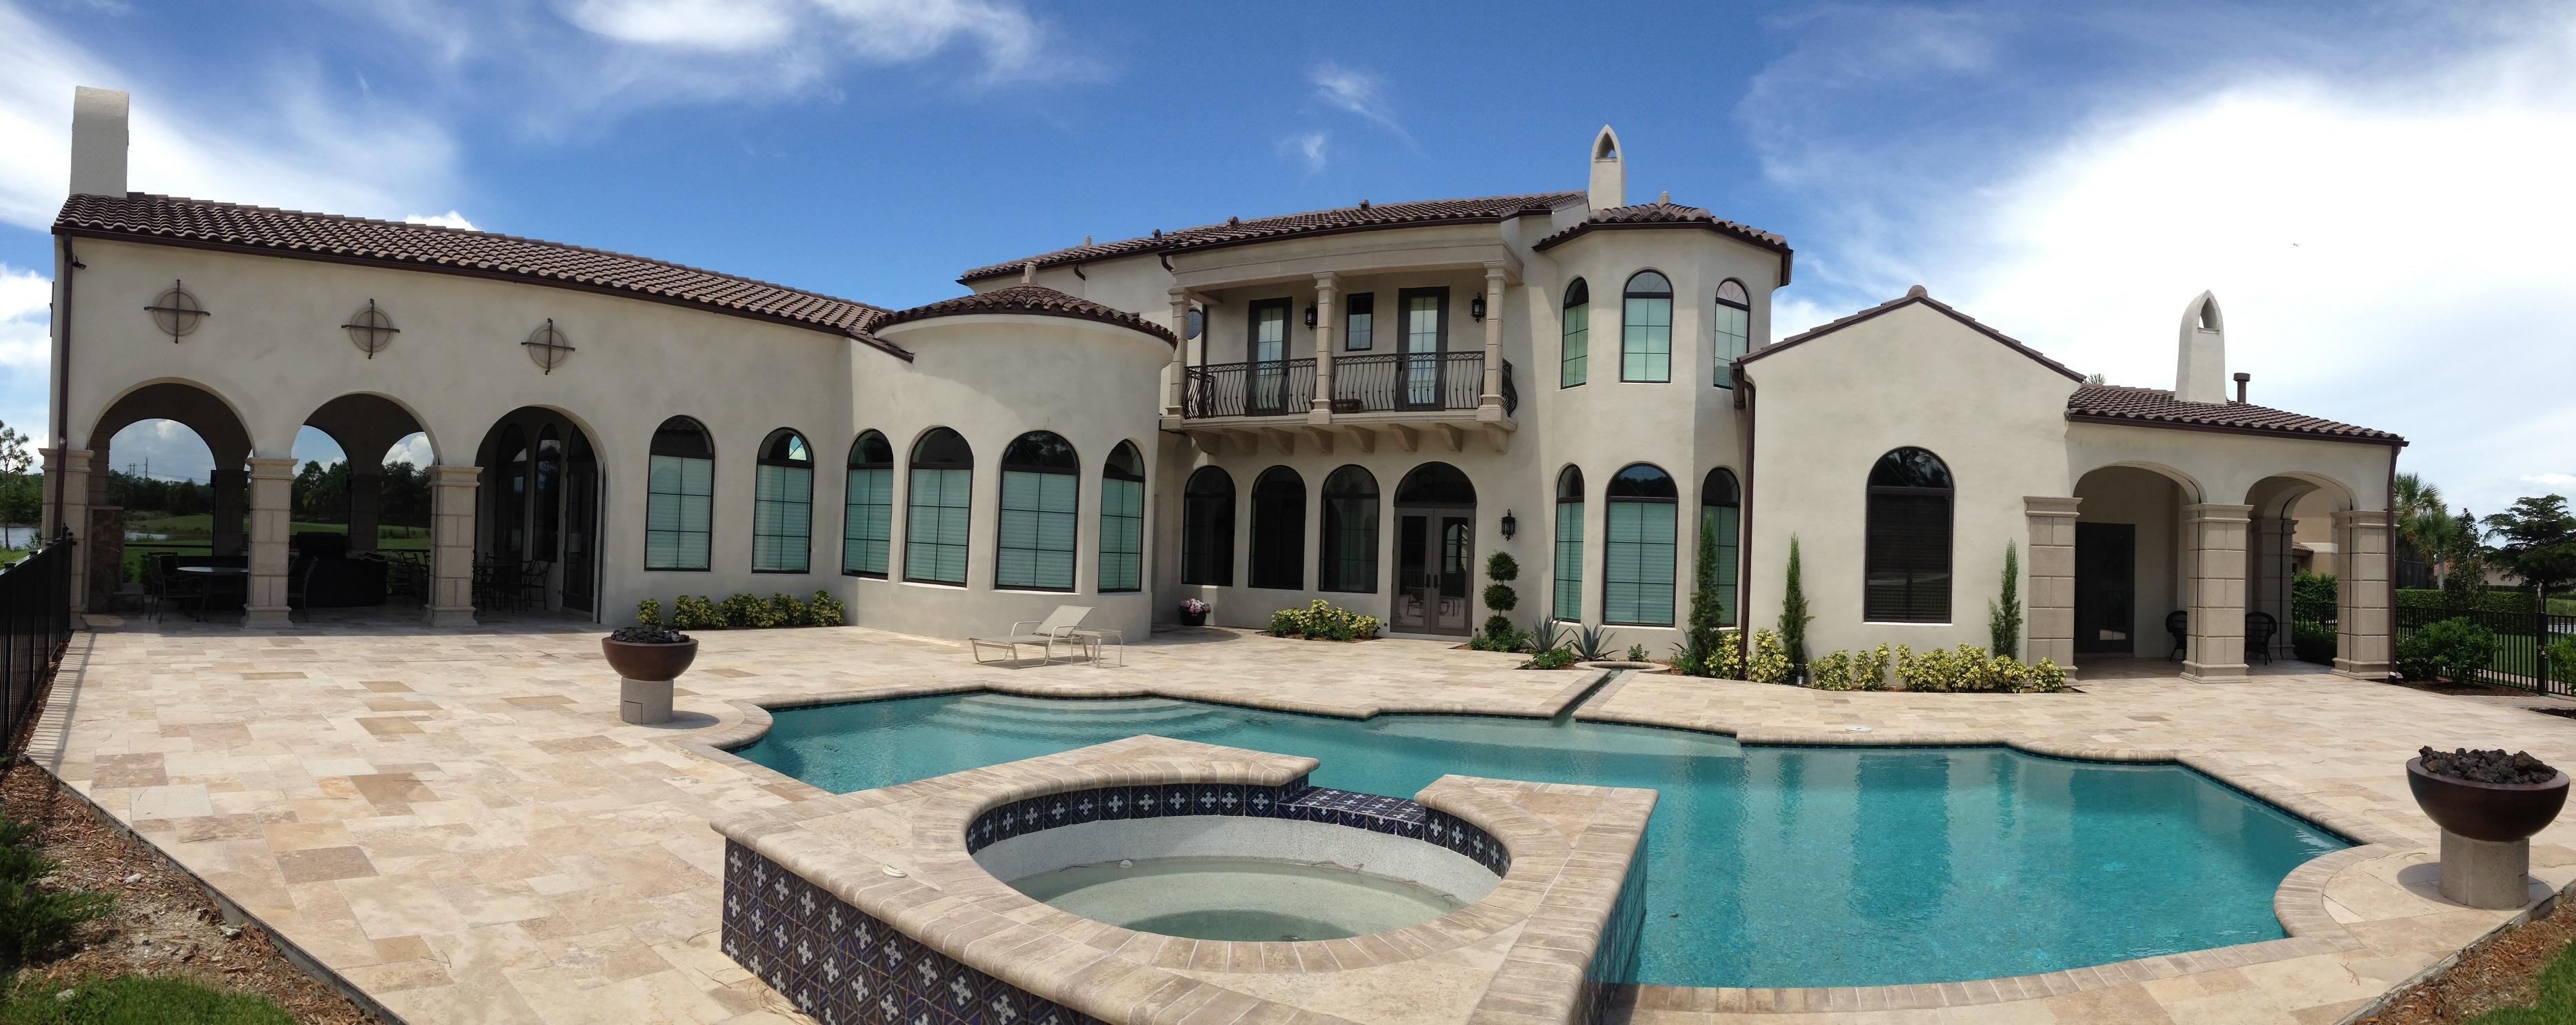 Luxurious Windows and Doors